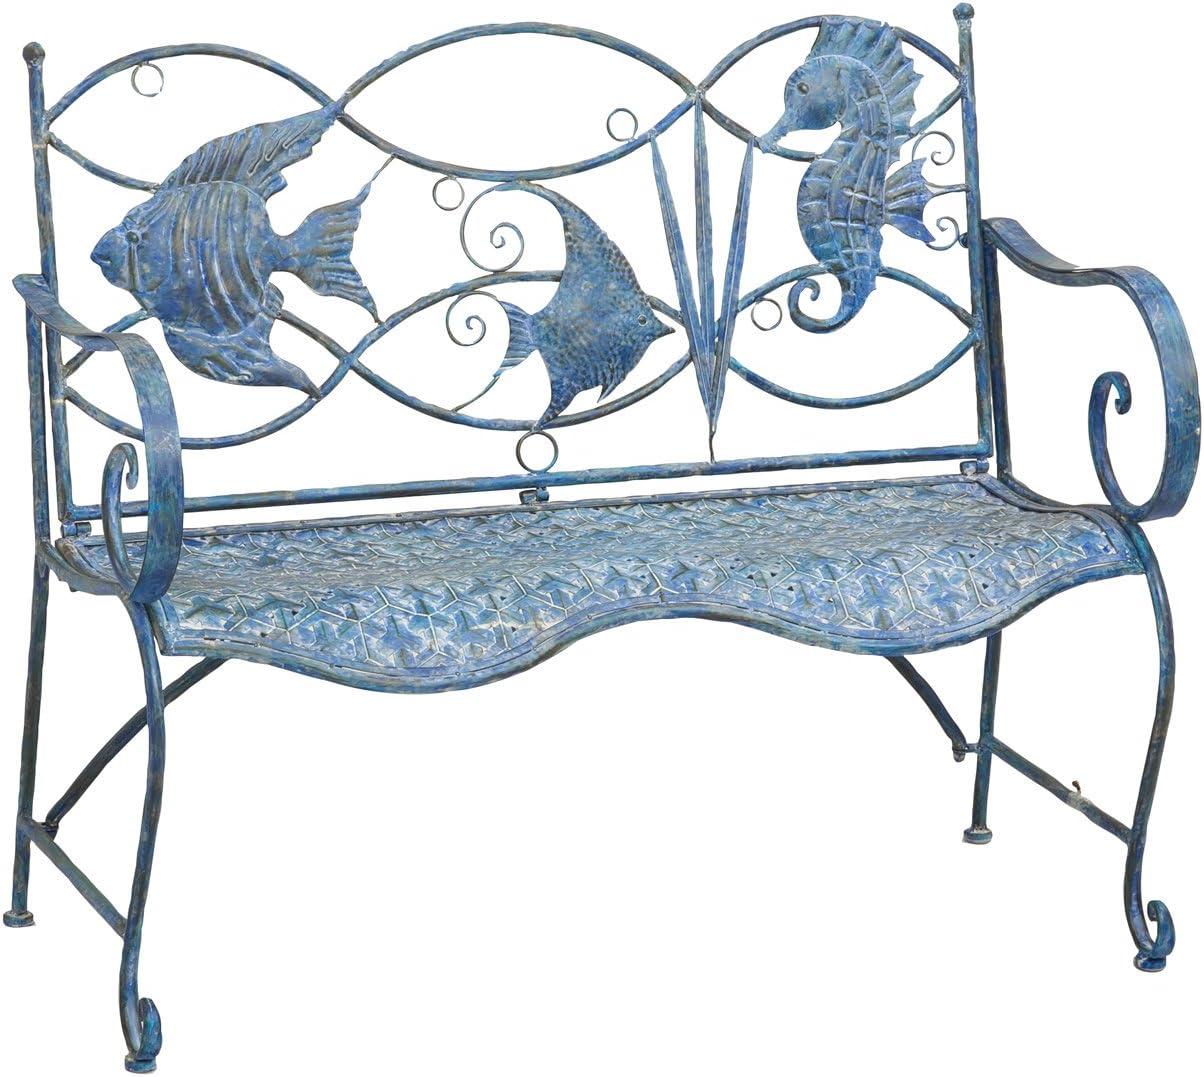 Cape Craftsmen Blue Fish Outdoor Safe Metal Bench